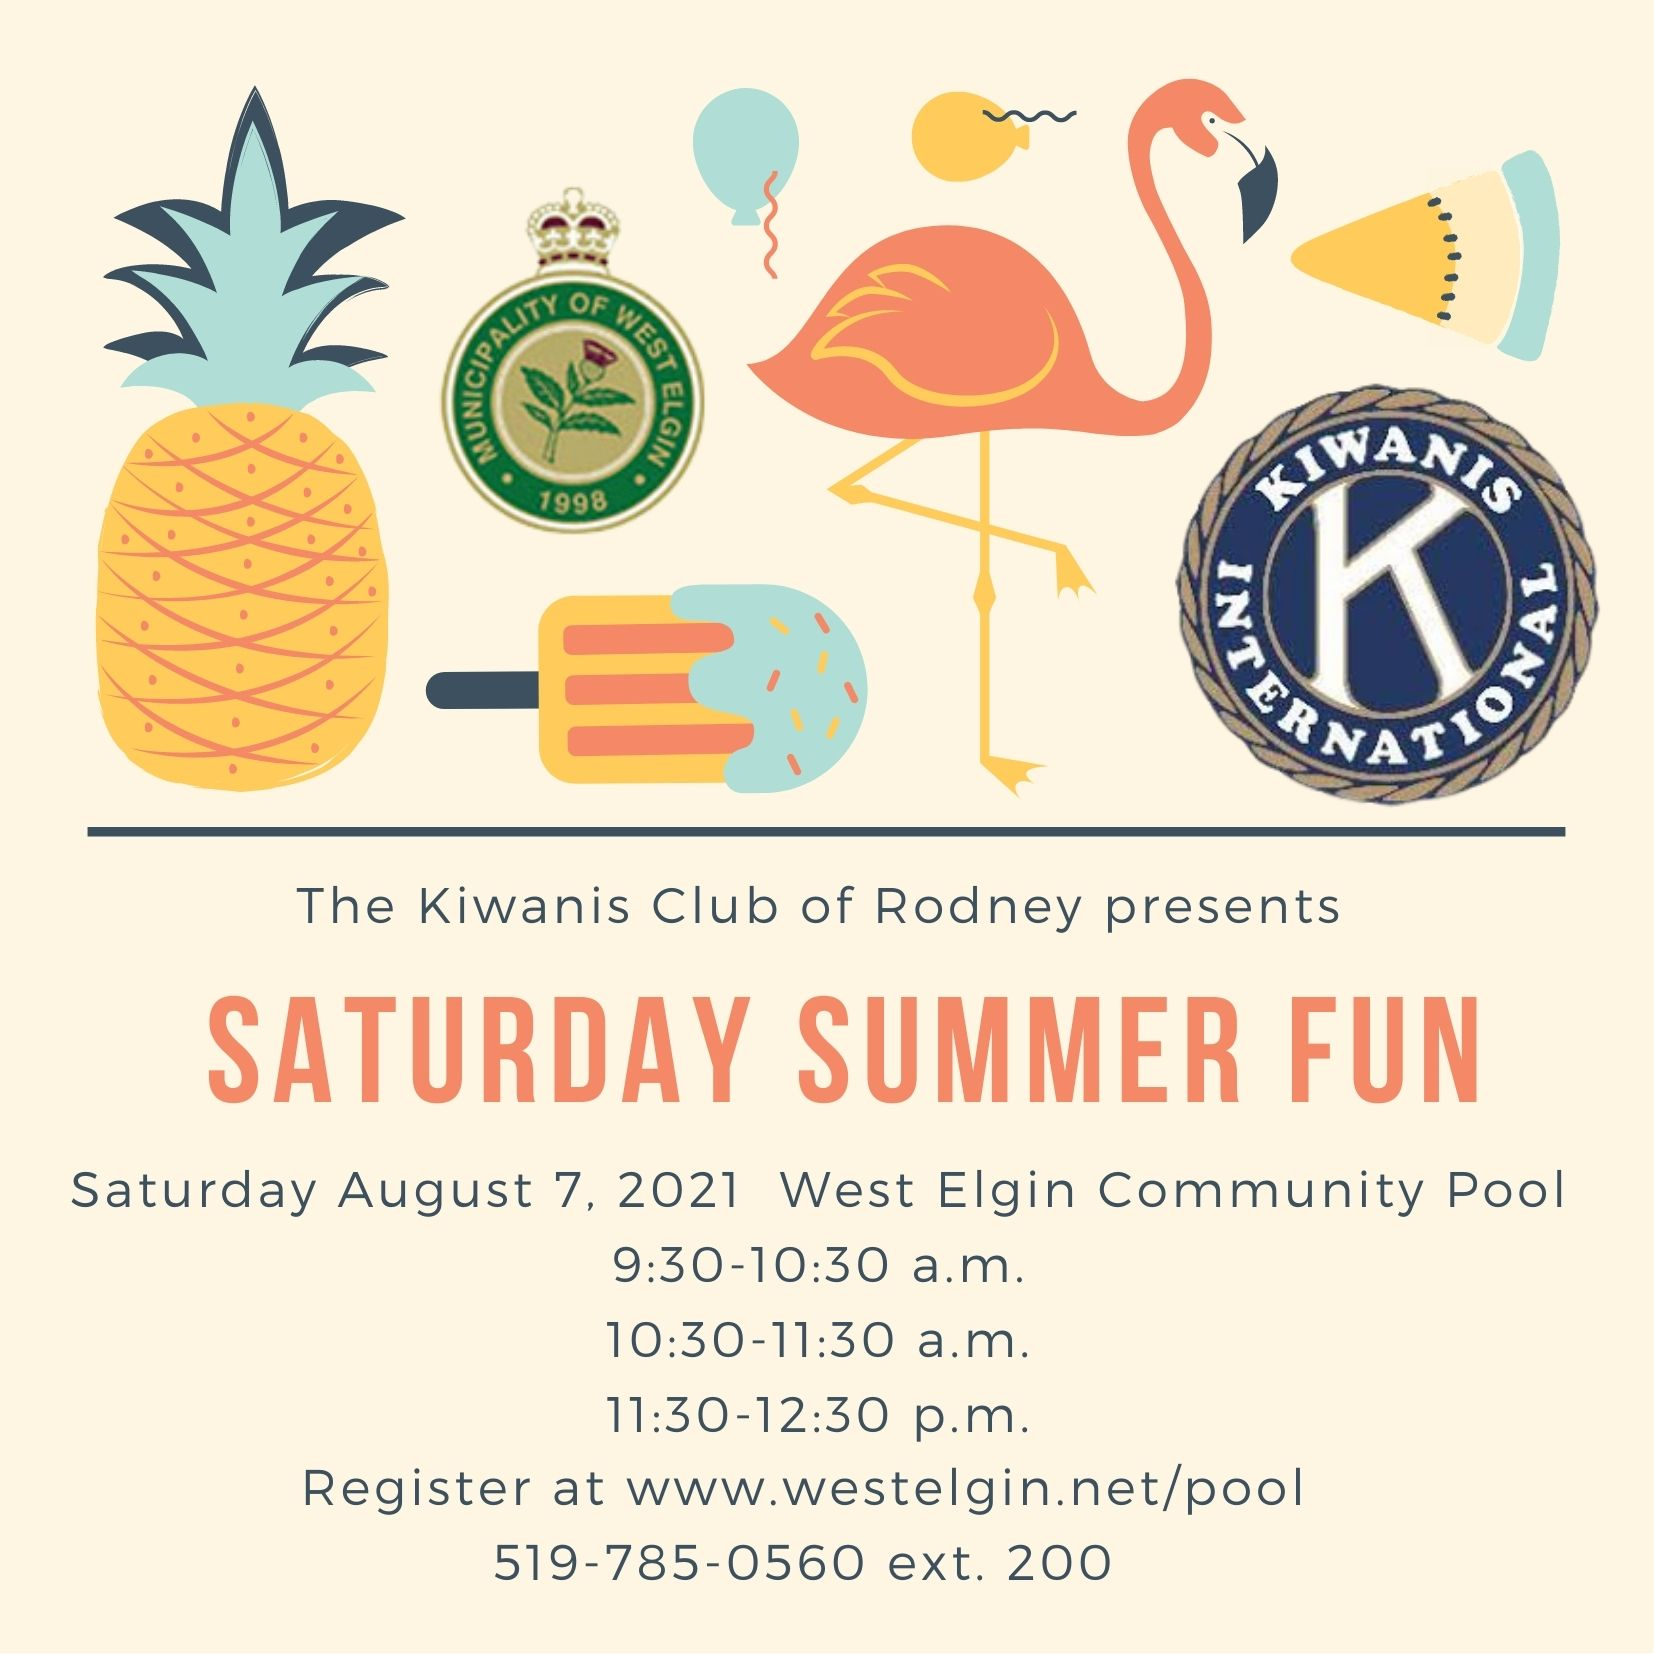 Saturday Summer Fun August 7 morning swim times